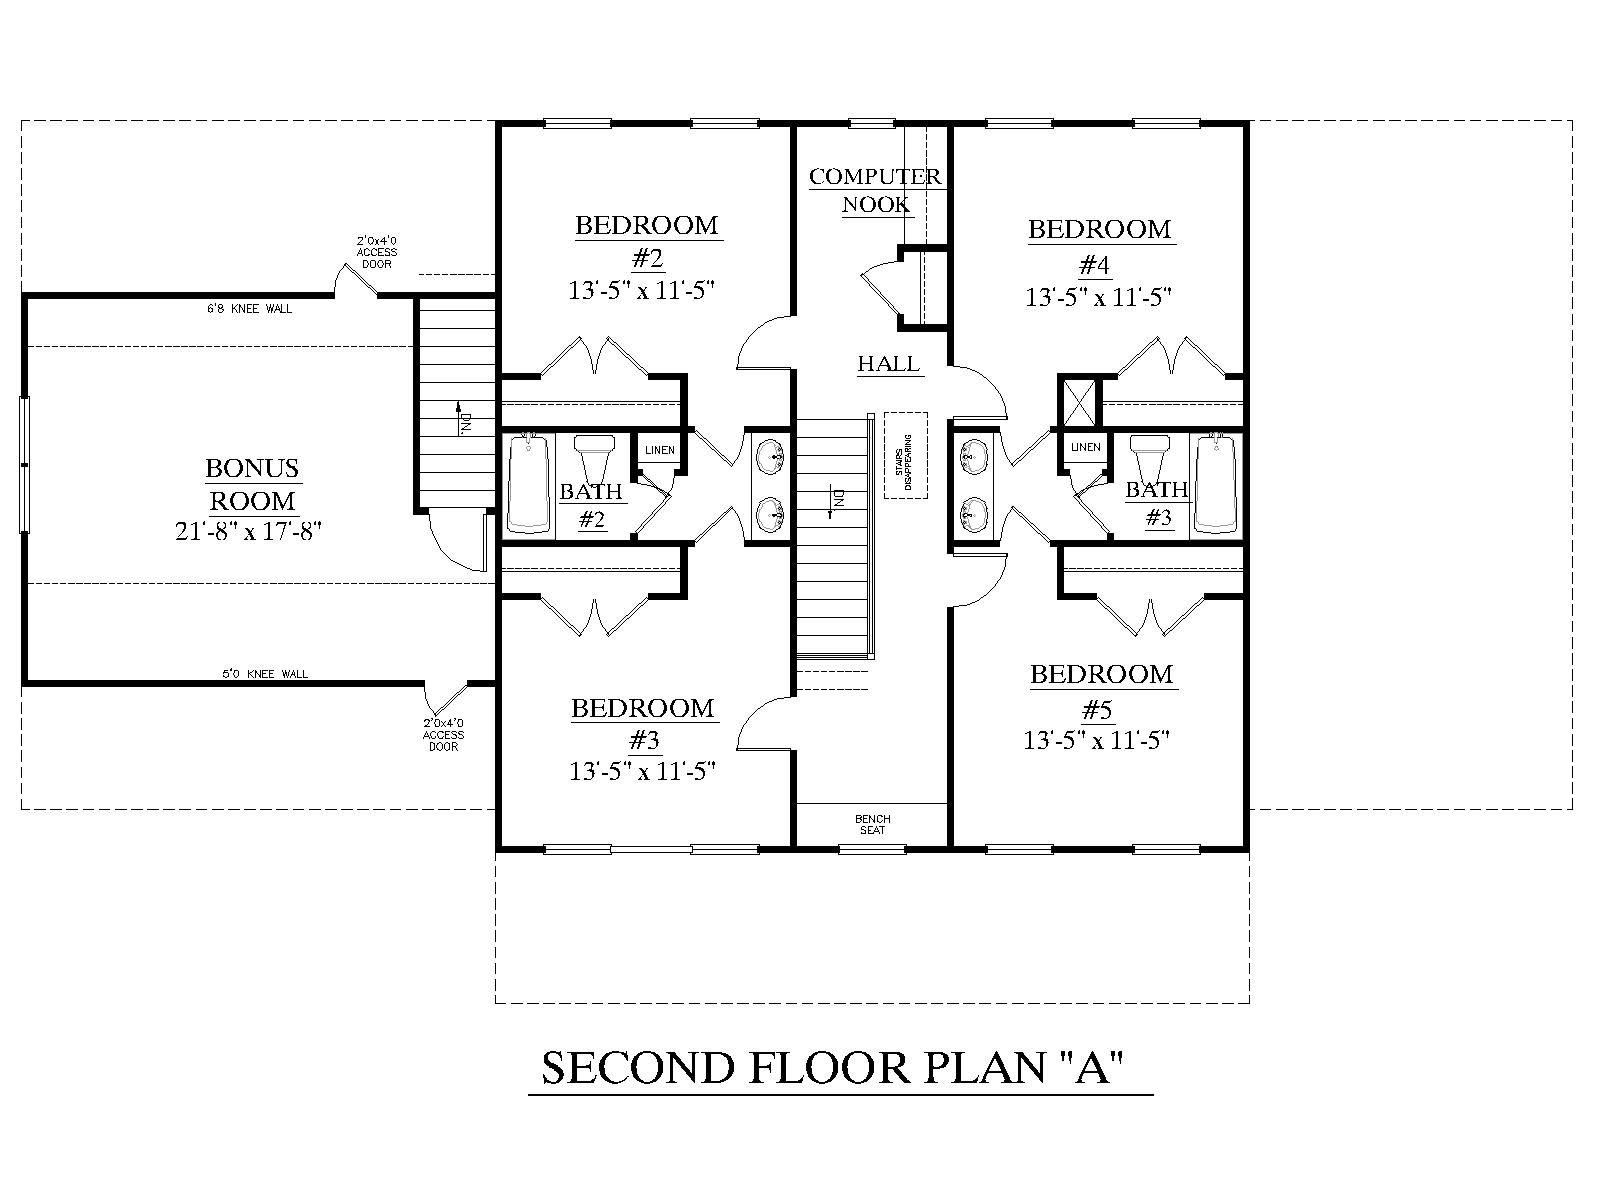 House Plan C Pendleton Second Floor